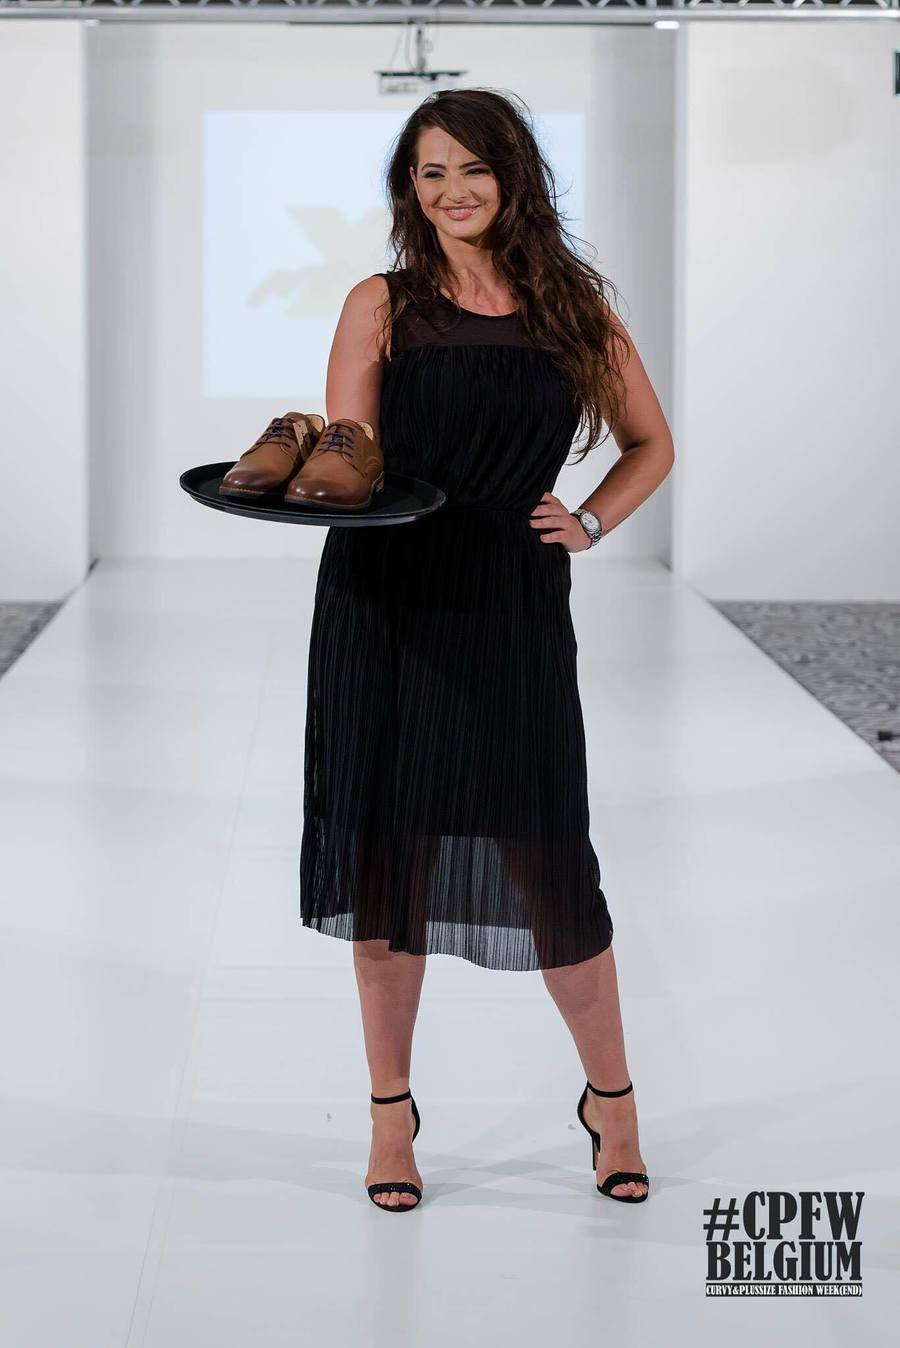 Shoes! / Model Adela Lupse / Uploaded 12th September 2016 @ 02:13 PM